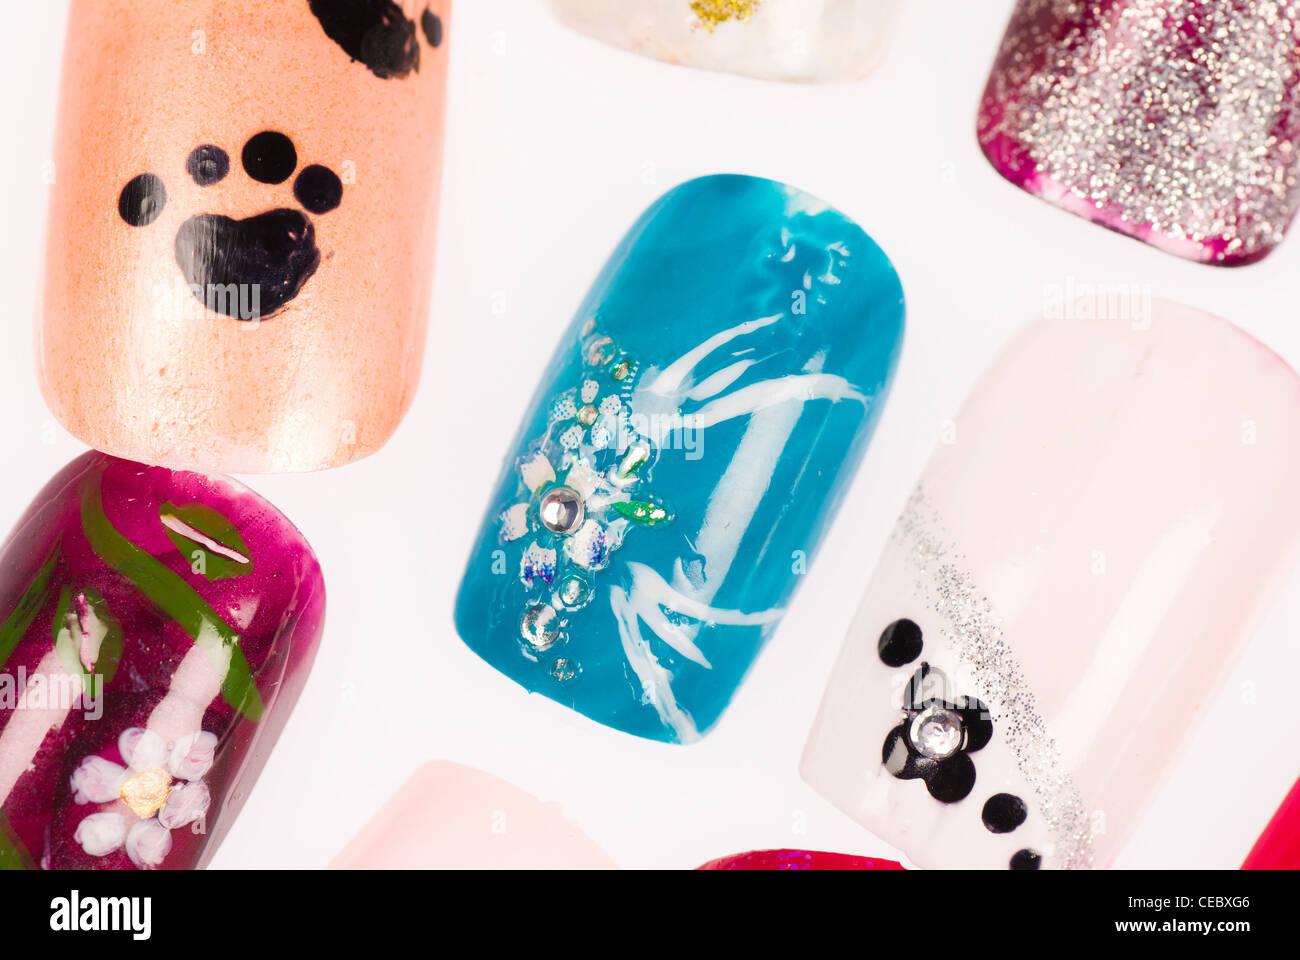 Wunderbar Diamant Verzierte Nägel Galerie - Nagellack-Design-Ideen ...